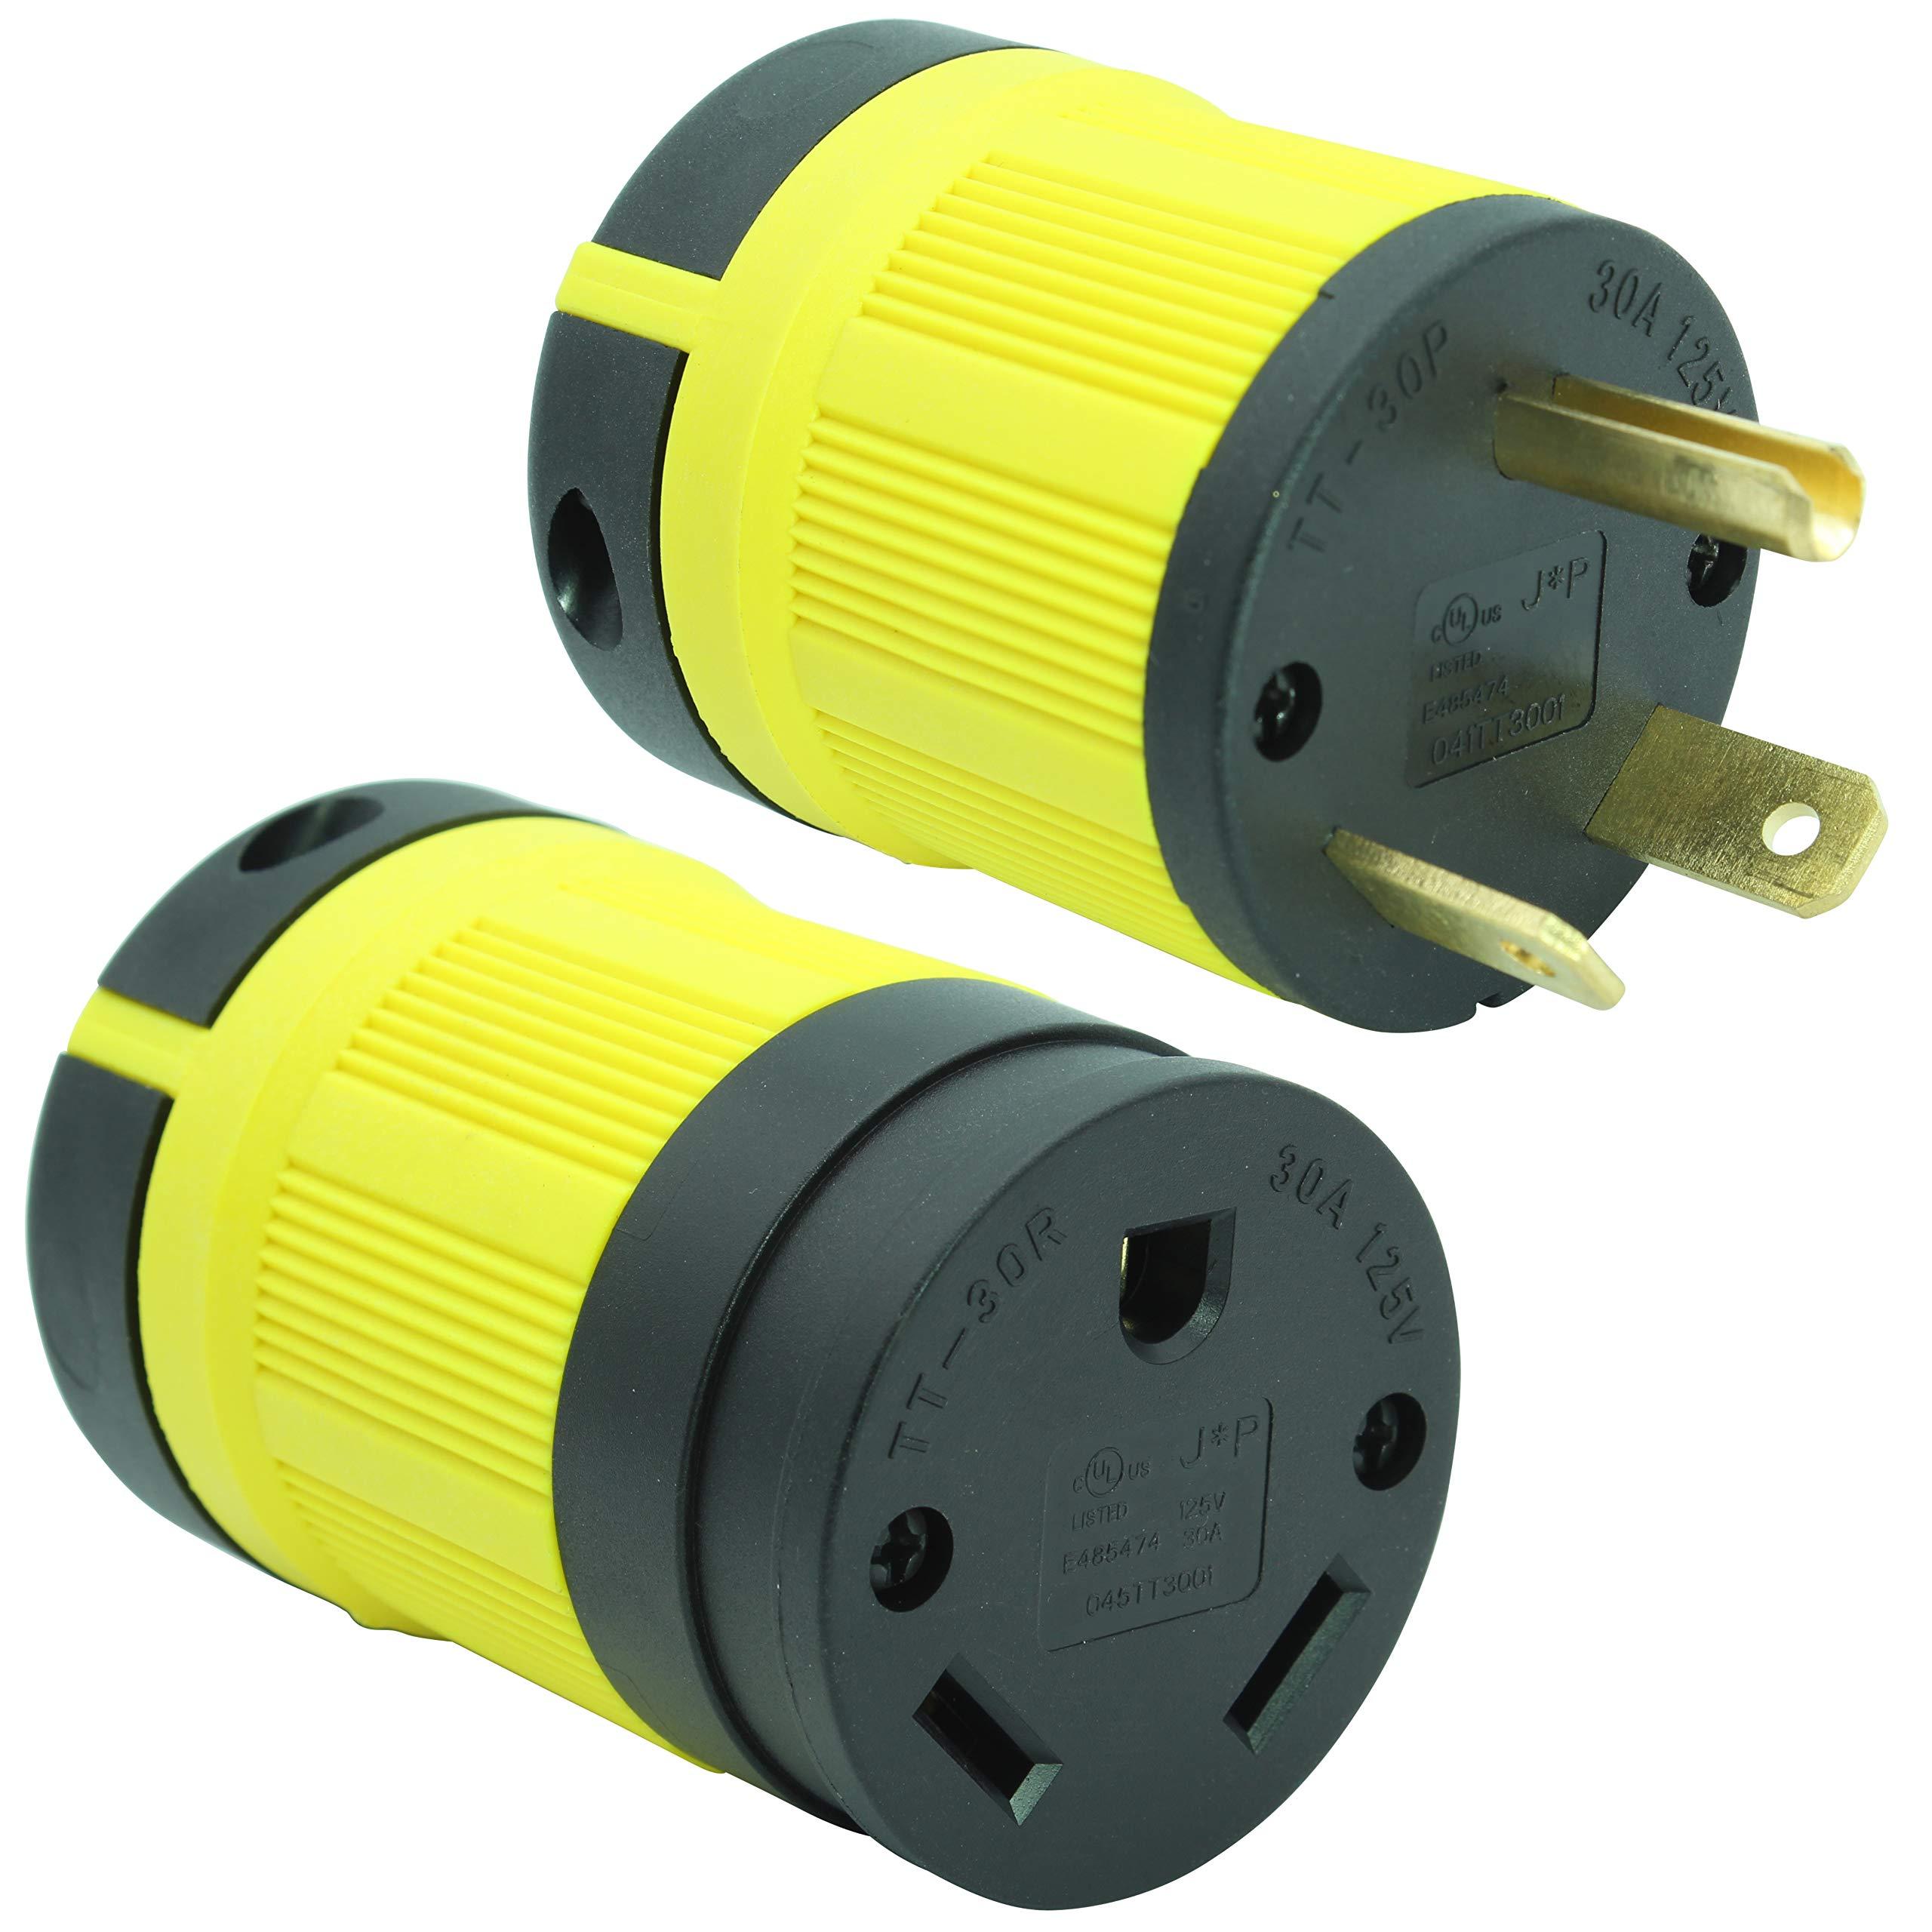 Journeyman-Pro 30 Amp, Plug & Connector Set, NEMA TT-30P + TT-30R, 125V, Straight Blade RV Trailer Plug Connector Combo, Black/Yellow Industrial Grade, Grounding 3750 Watts Generator TT30C (Yellow)